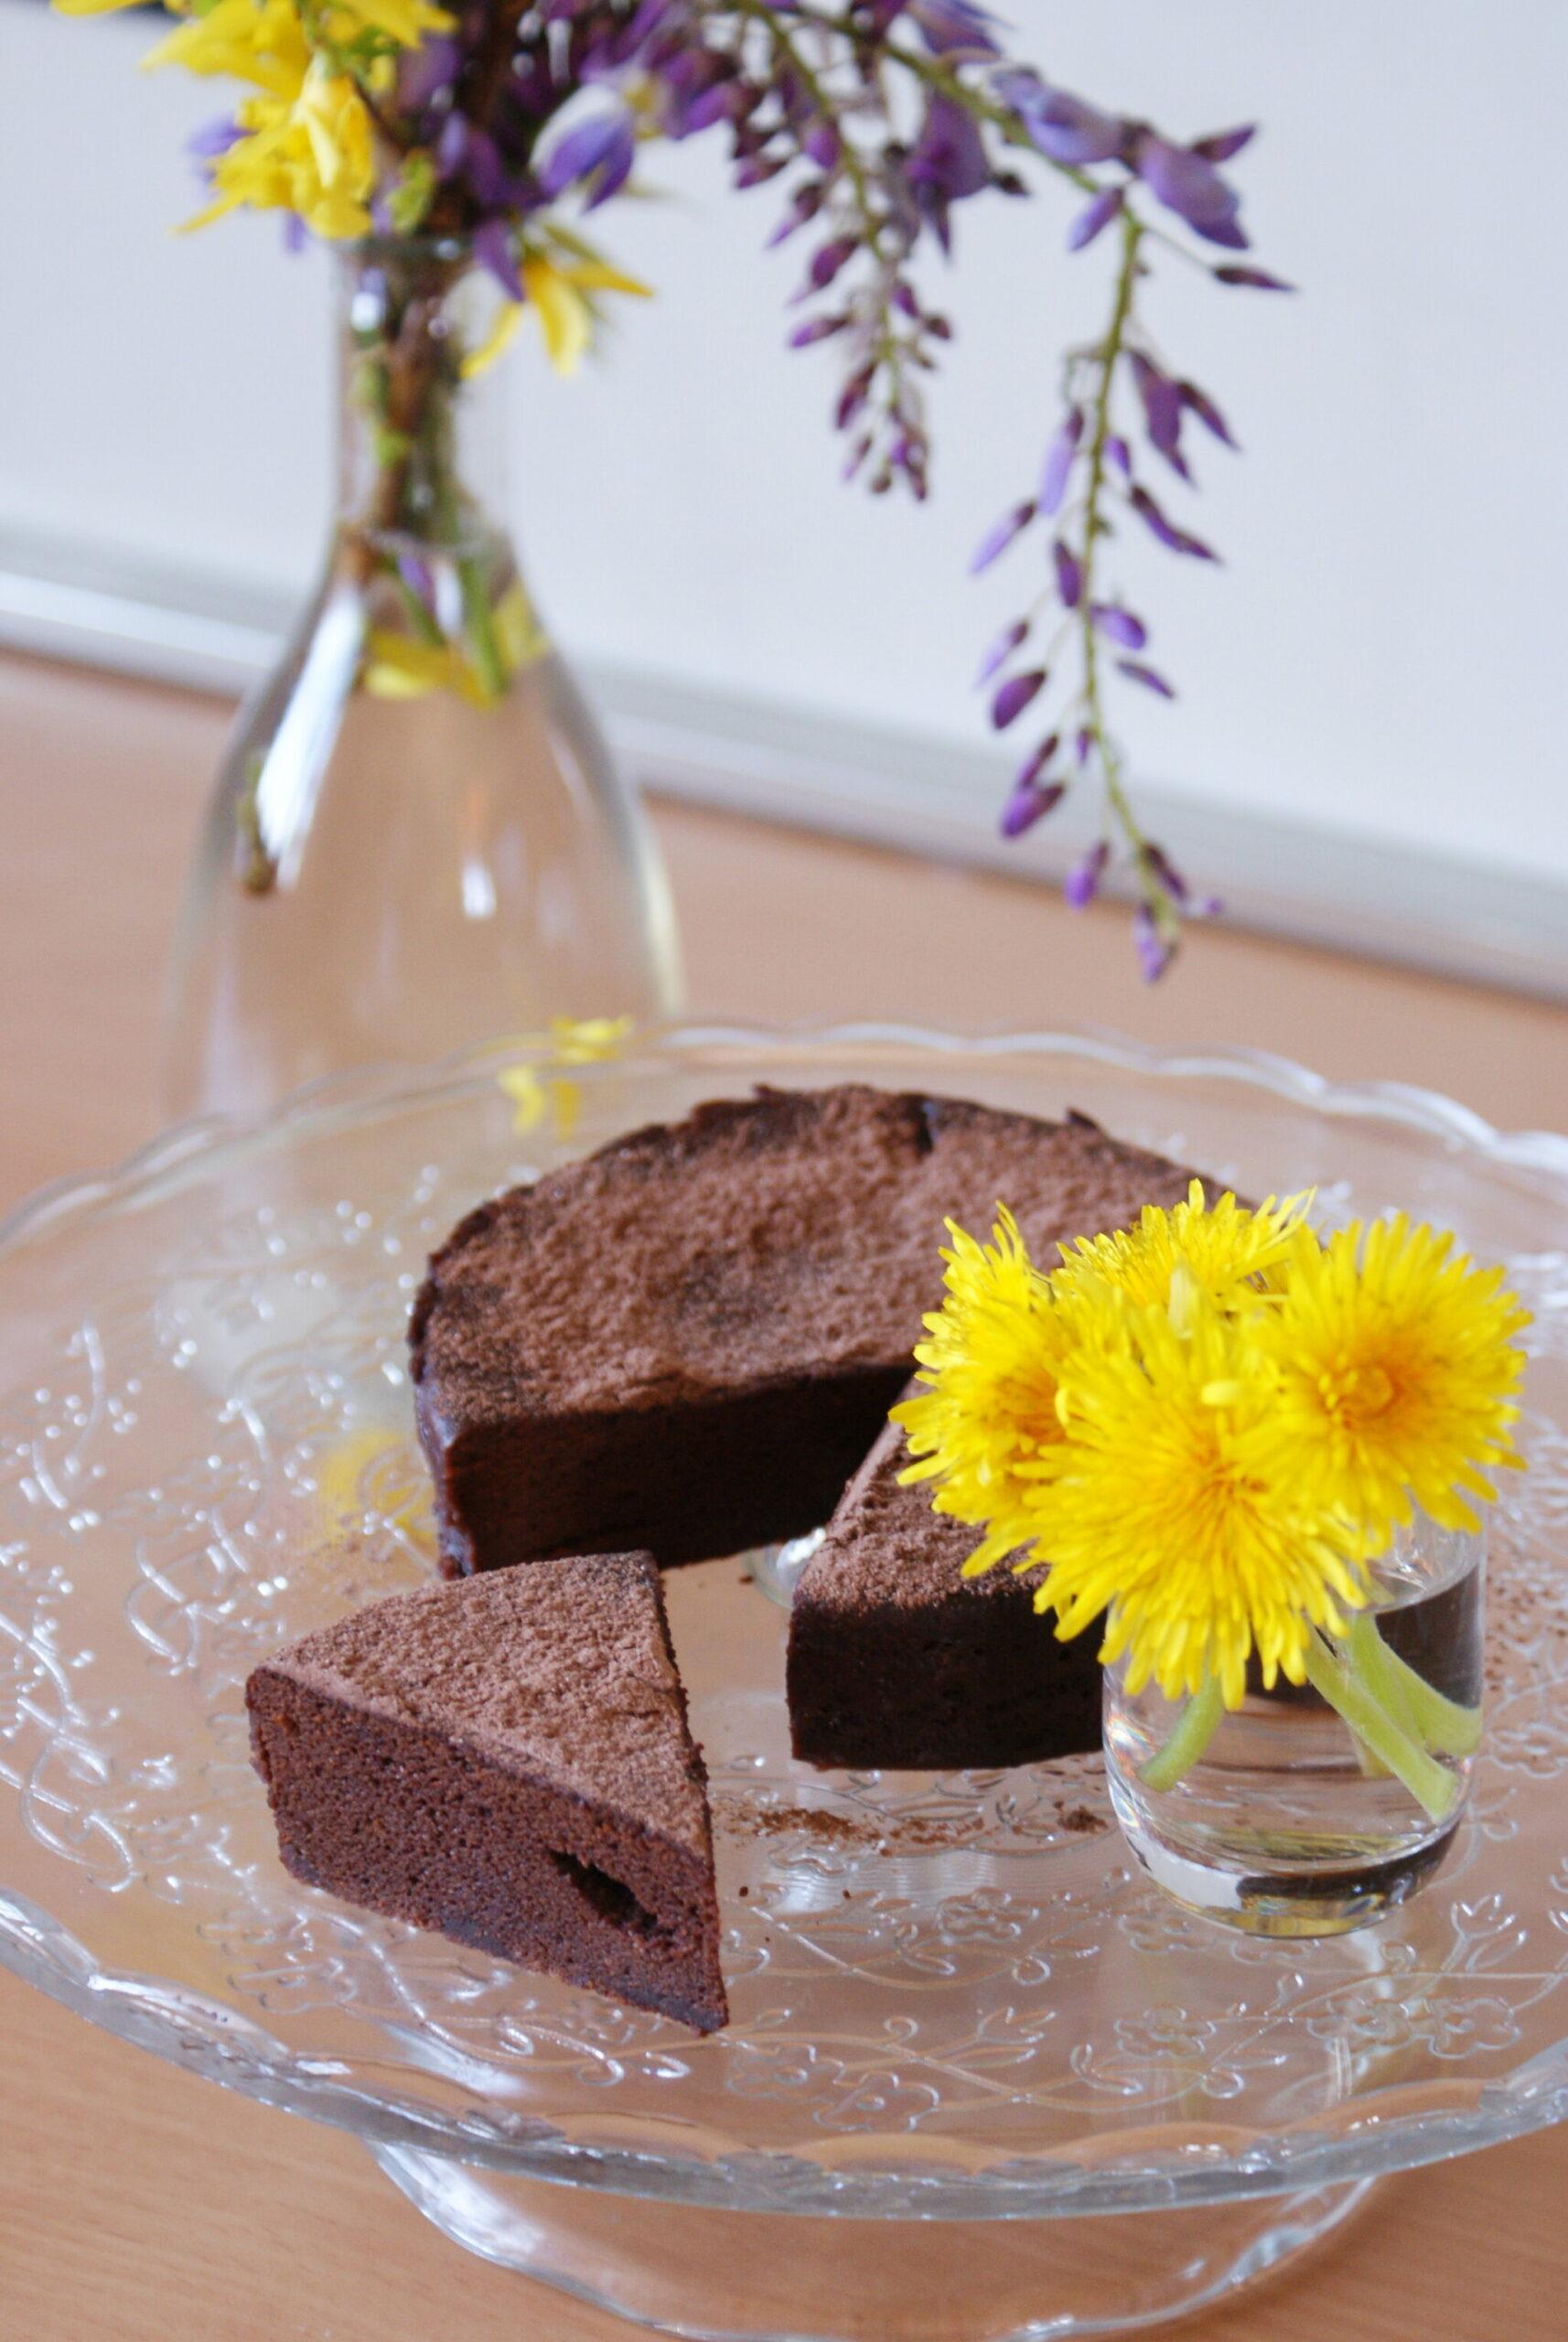 torta tortina cioccolato casa ricetta microonde 10 dieci minuti facile soffice francinesplaceblog